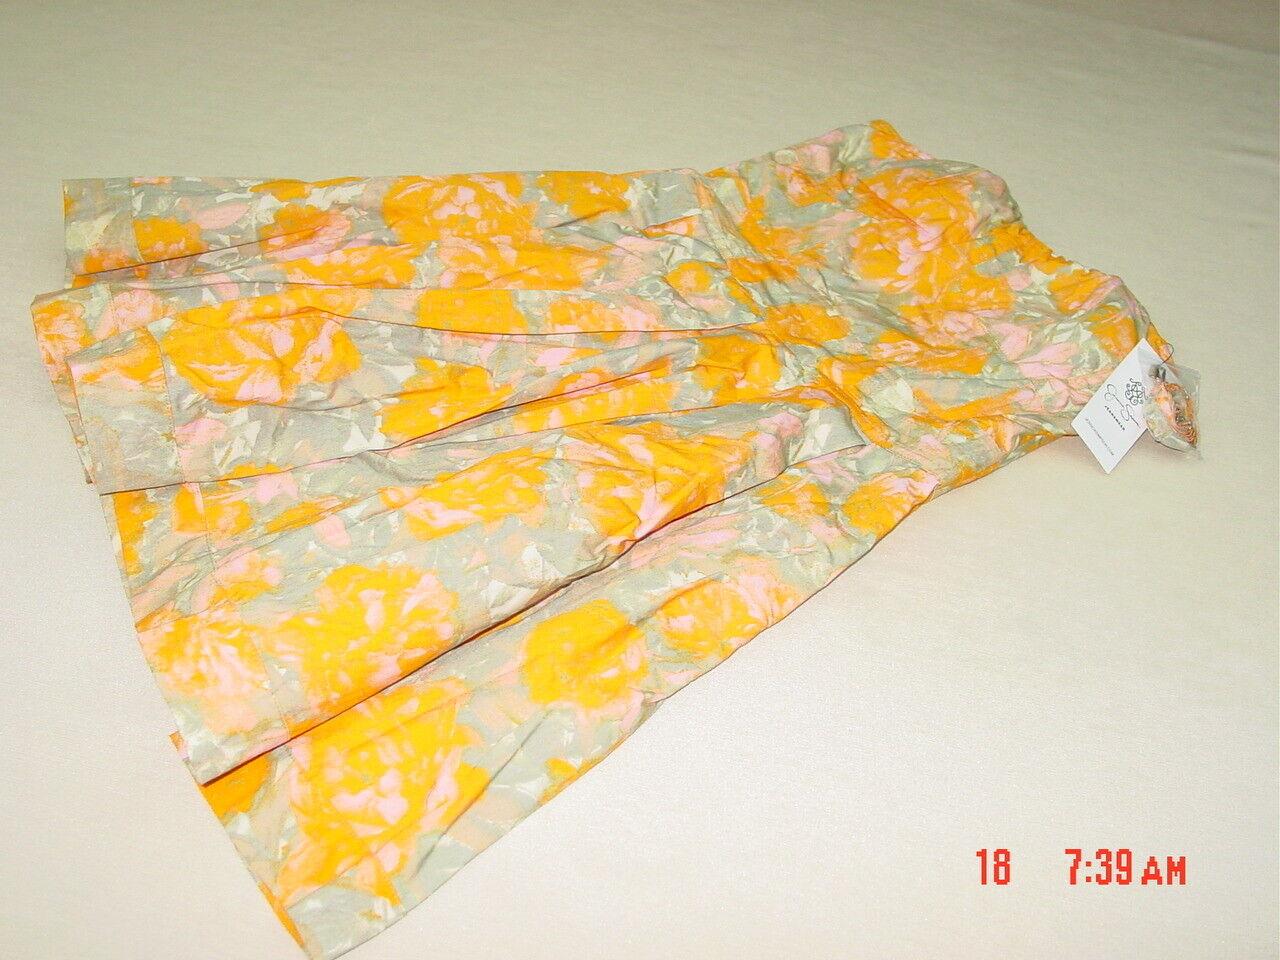 NWT Women's Women's Jessica Simpson Versatile Cyellow Mini Dress orange Floral